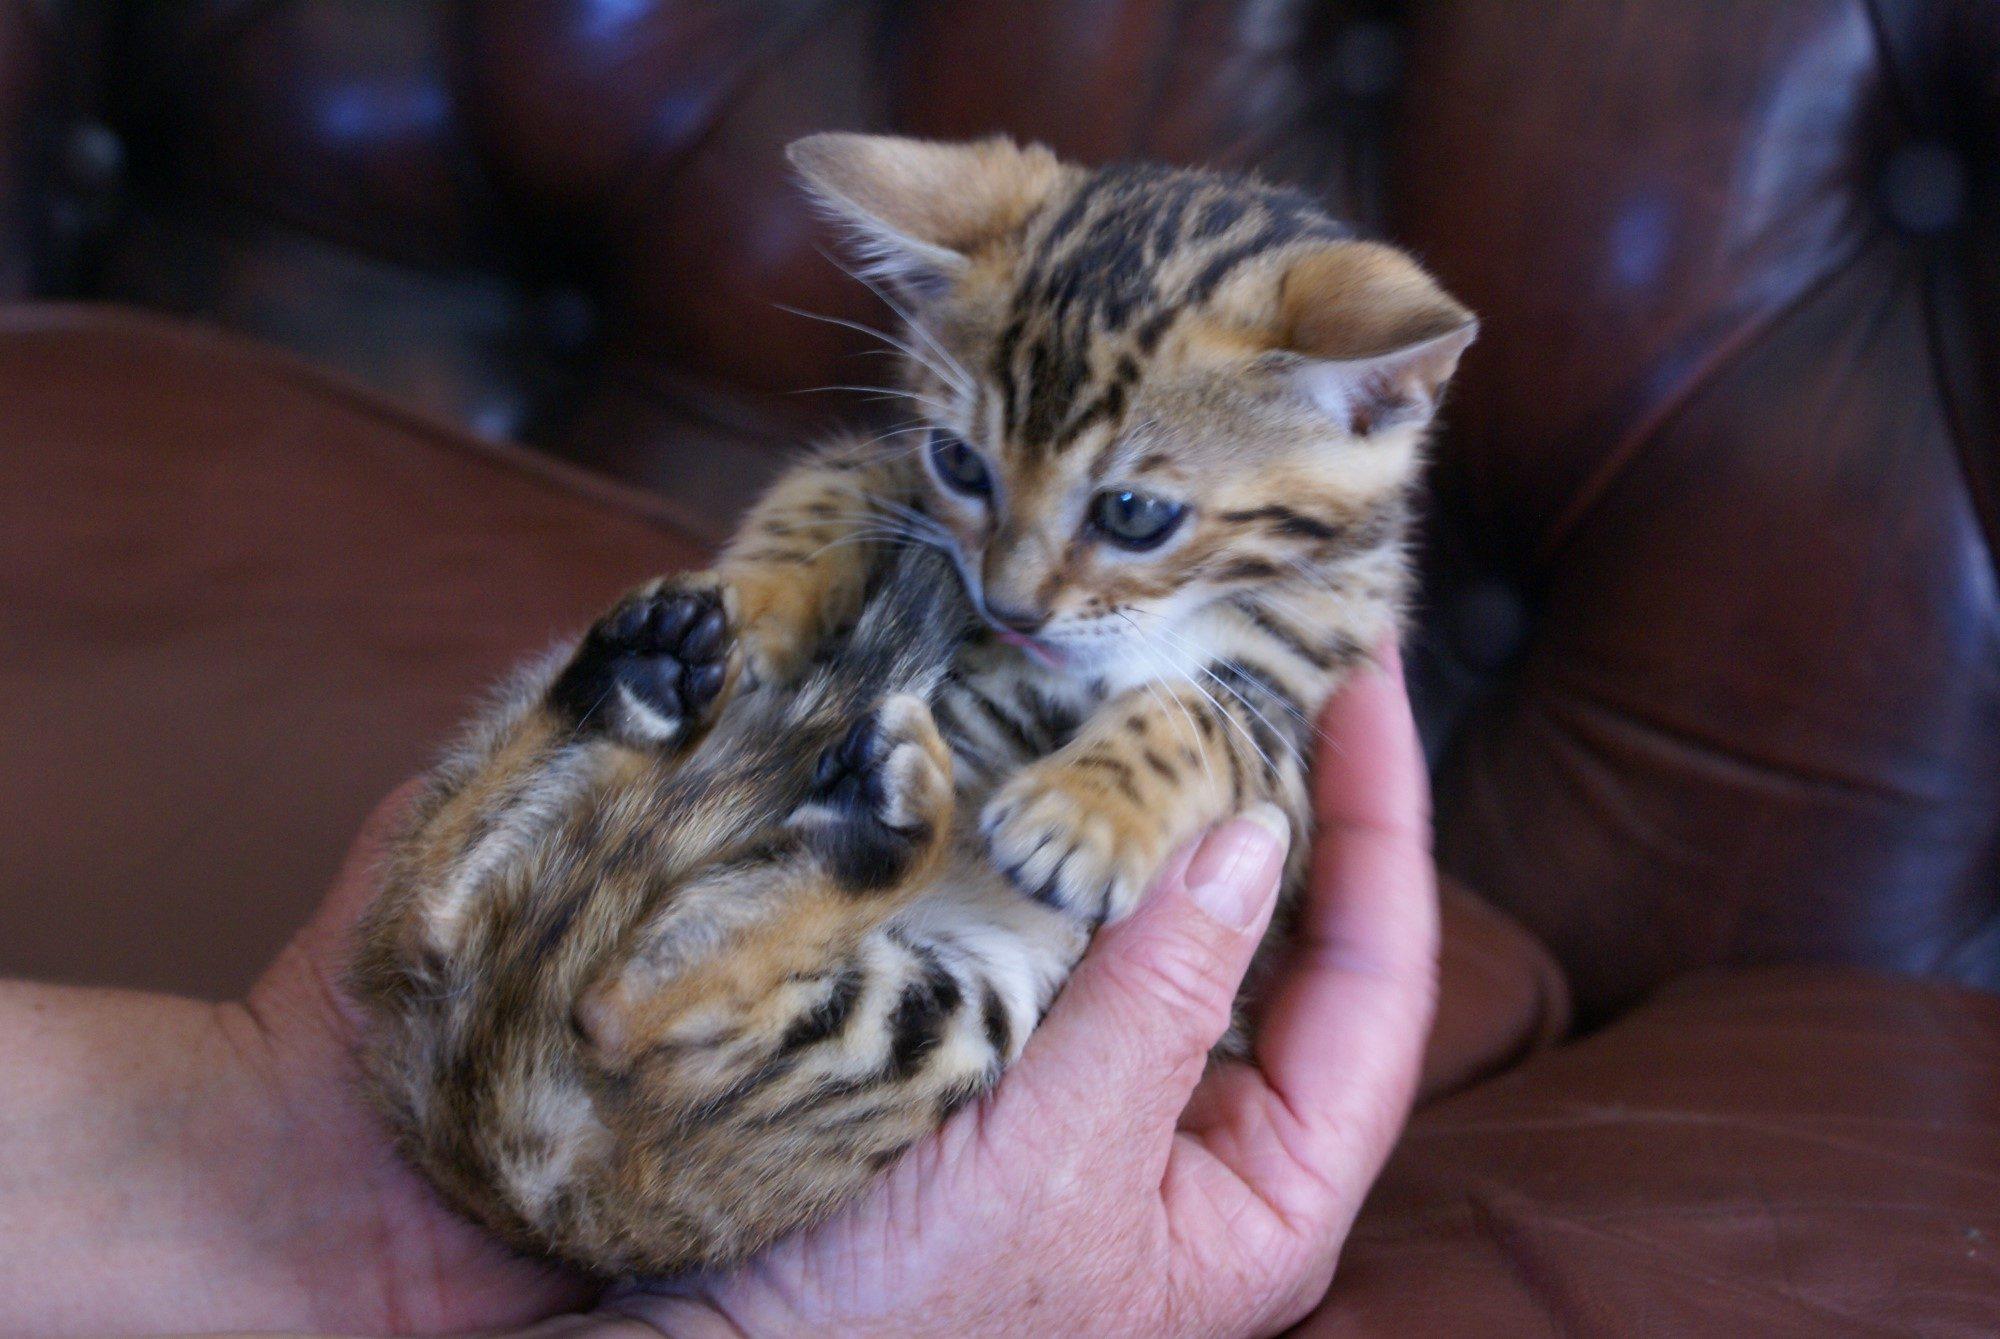 Photo 1 of Glow the Bengal kitten.